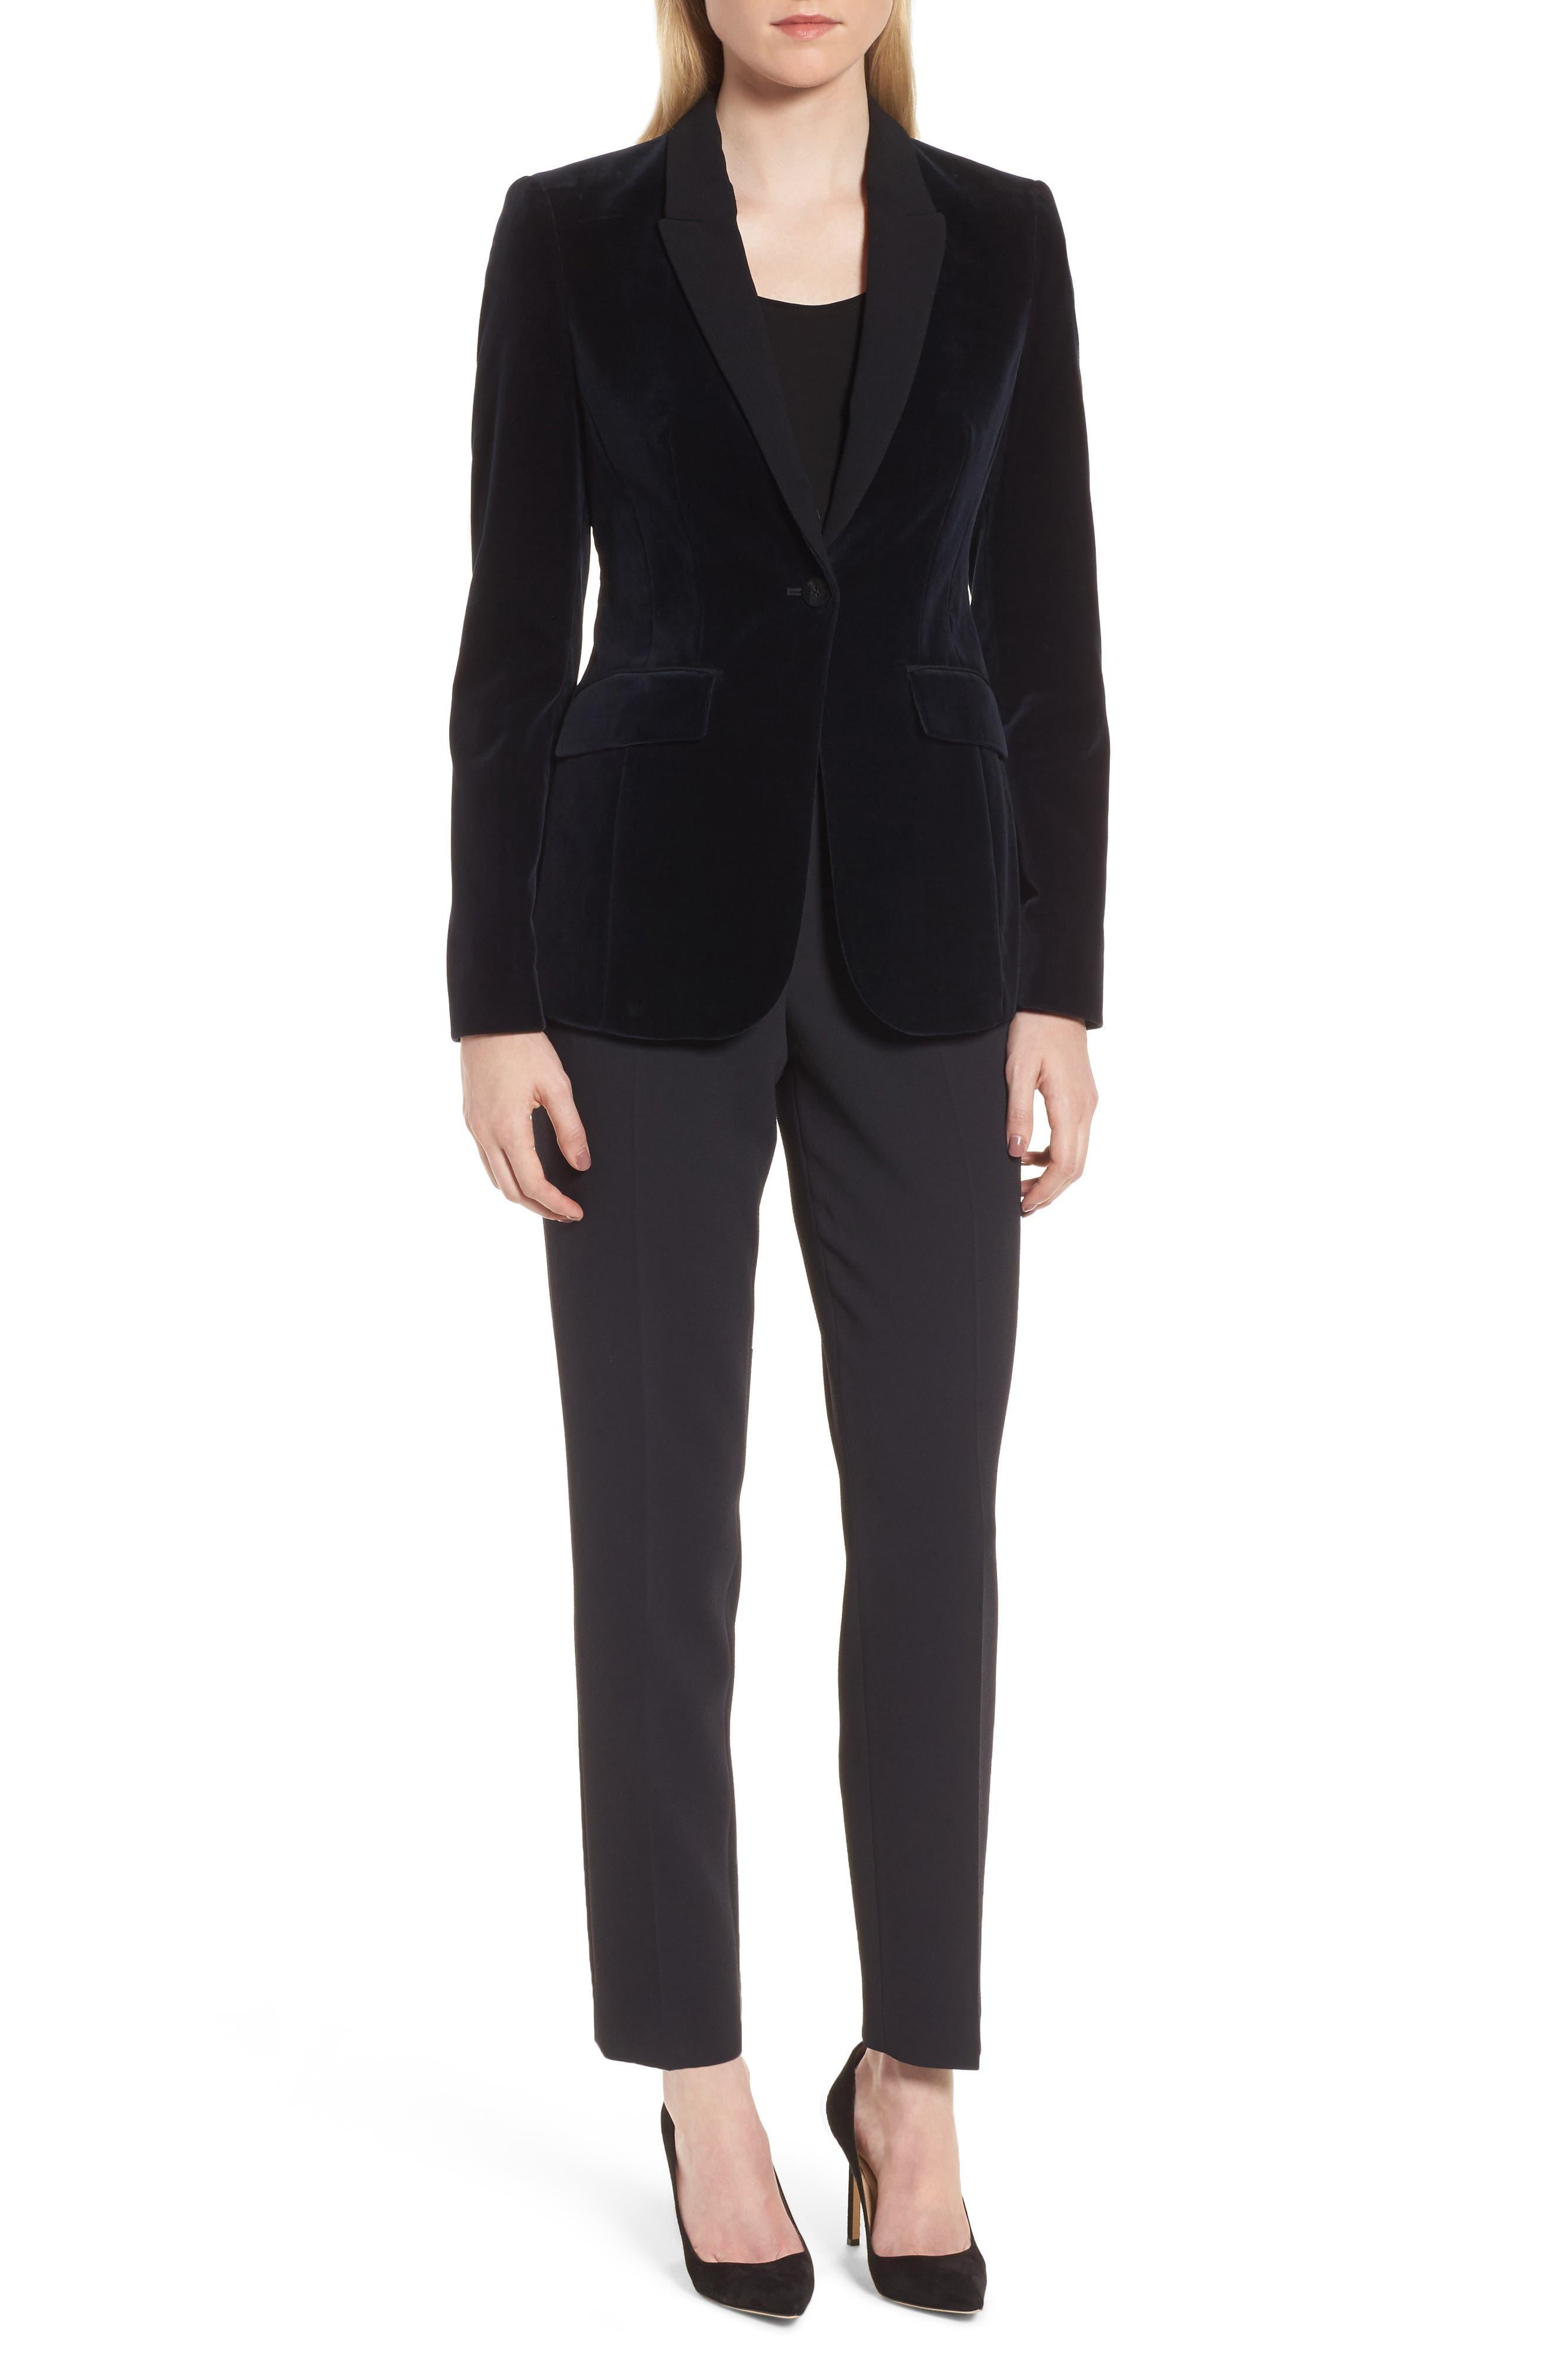 Jeronala Velvet Tuxedo Jacket,                             Alternate thumbnail 7, color,                             480